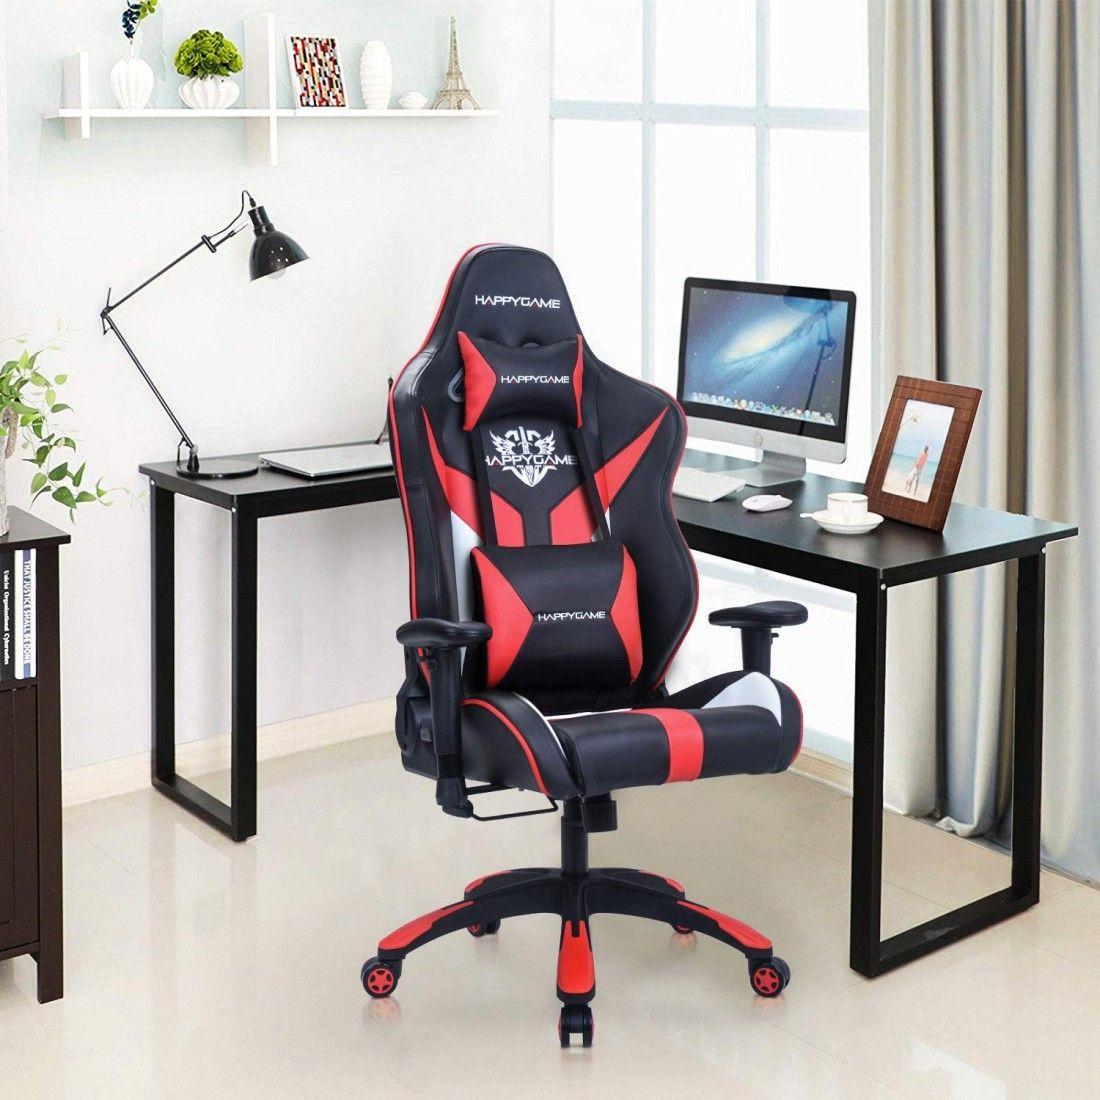 Racing style gaming chair oversized high back ergonomic swivel